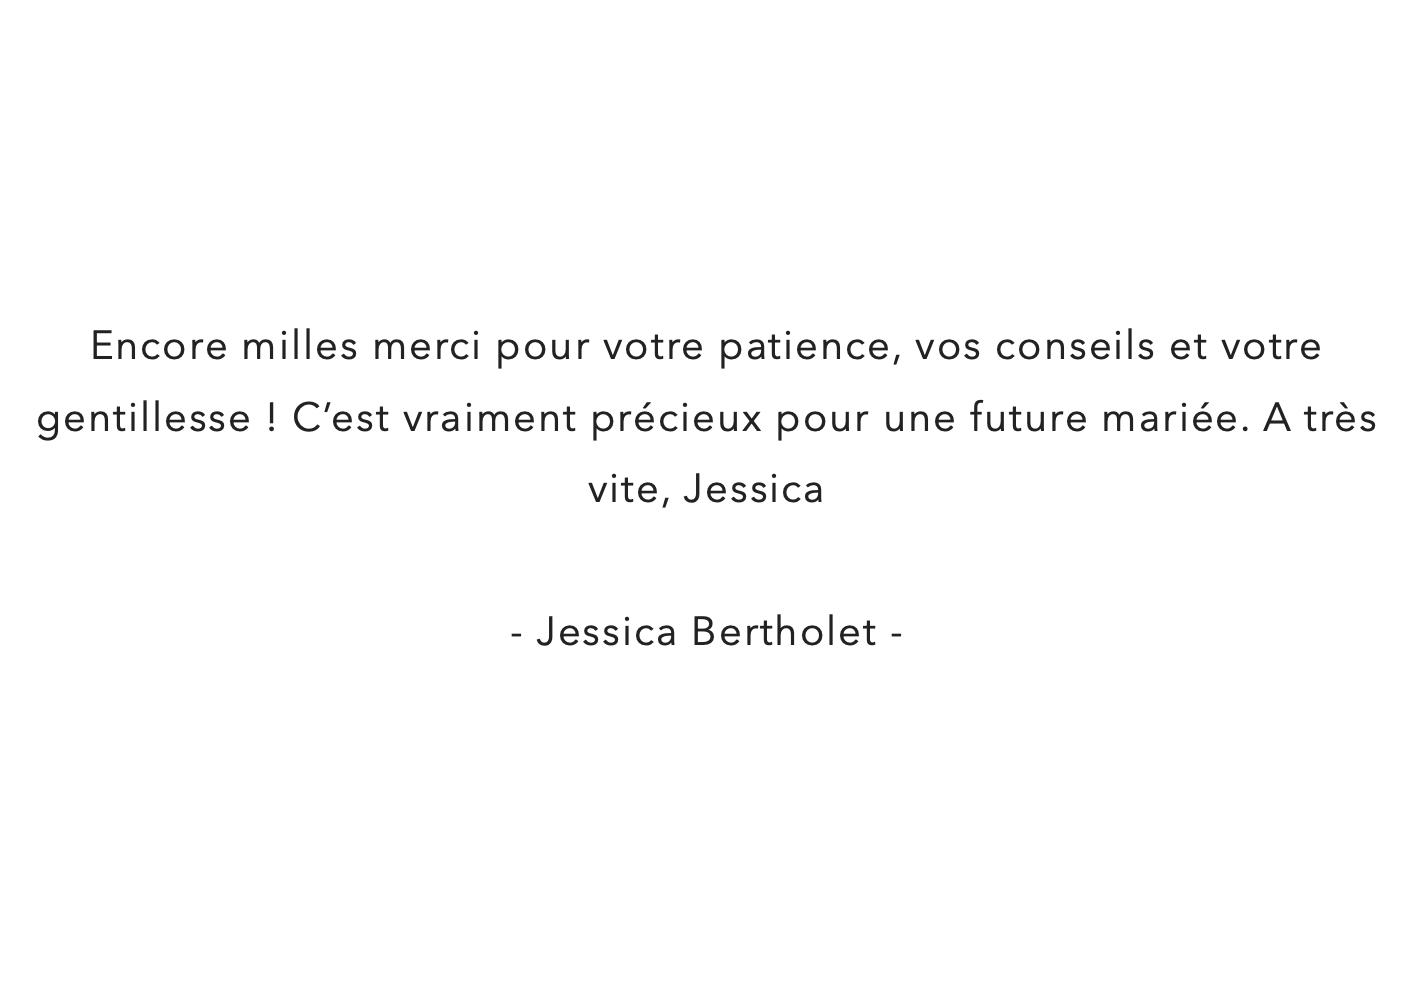 Jessica-Bertholet